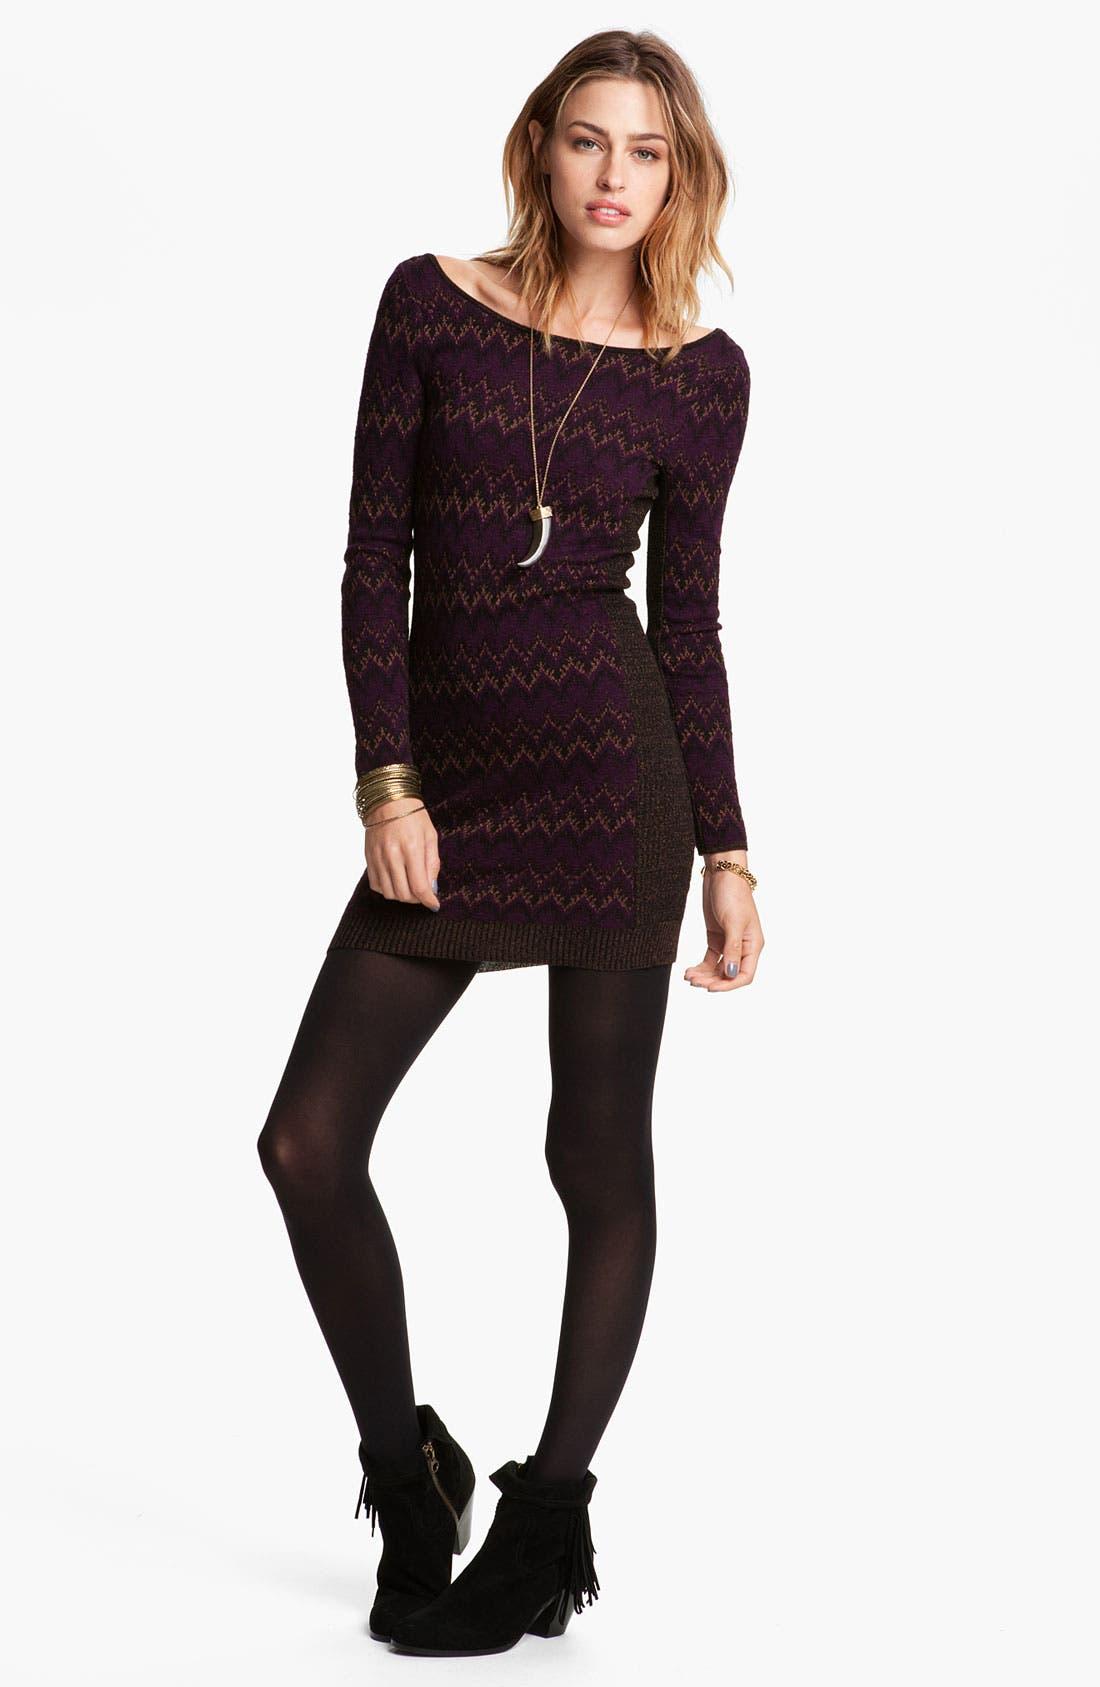 Main Image - Free People 'Cozy Cabin' Sweater Dress